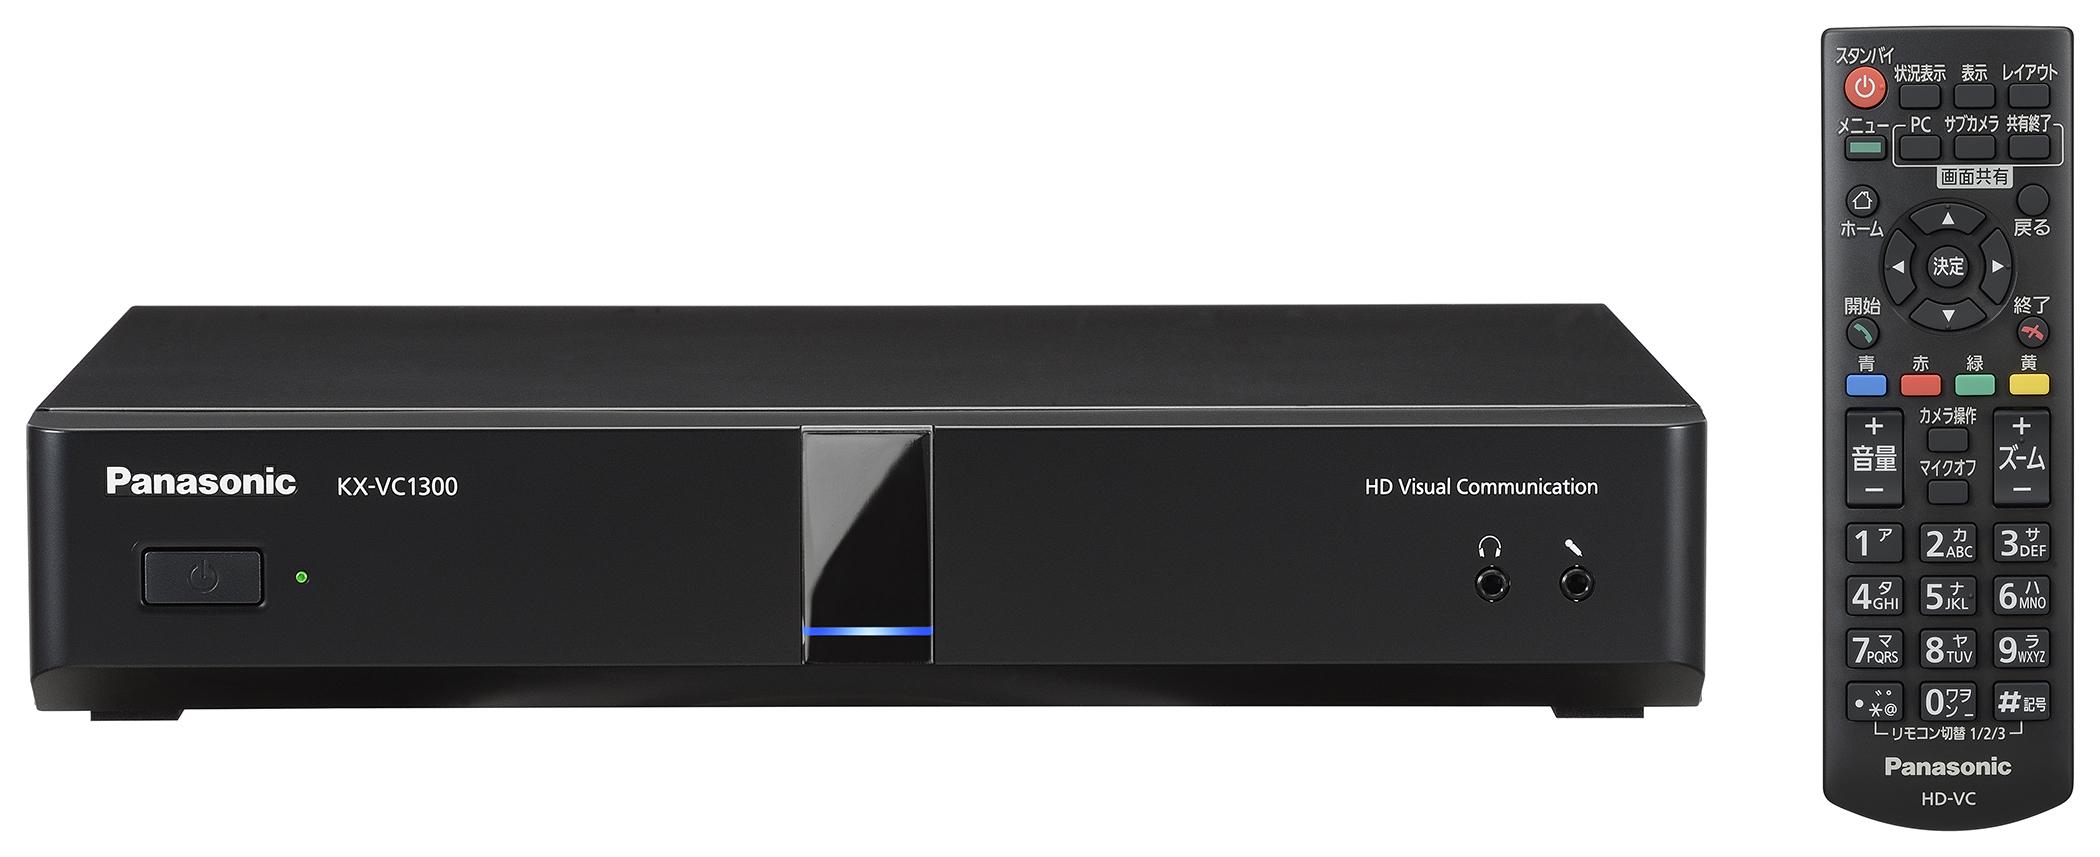 KX-VC1300J 高解像度用JPG